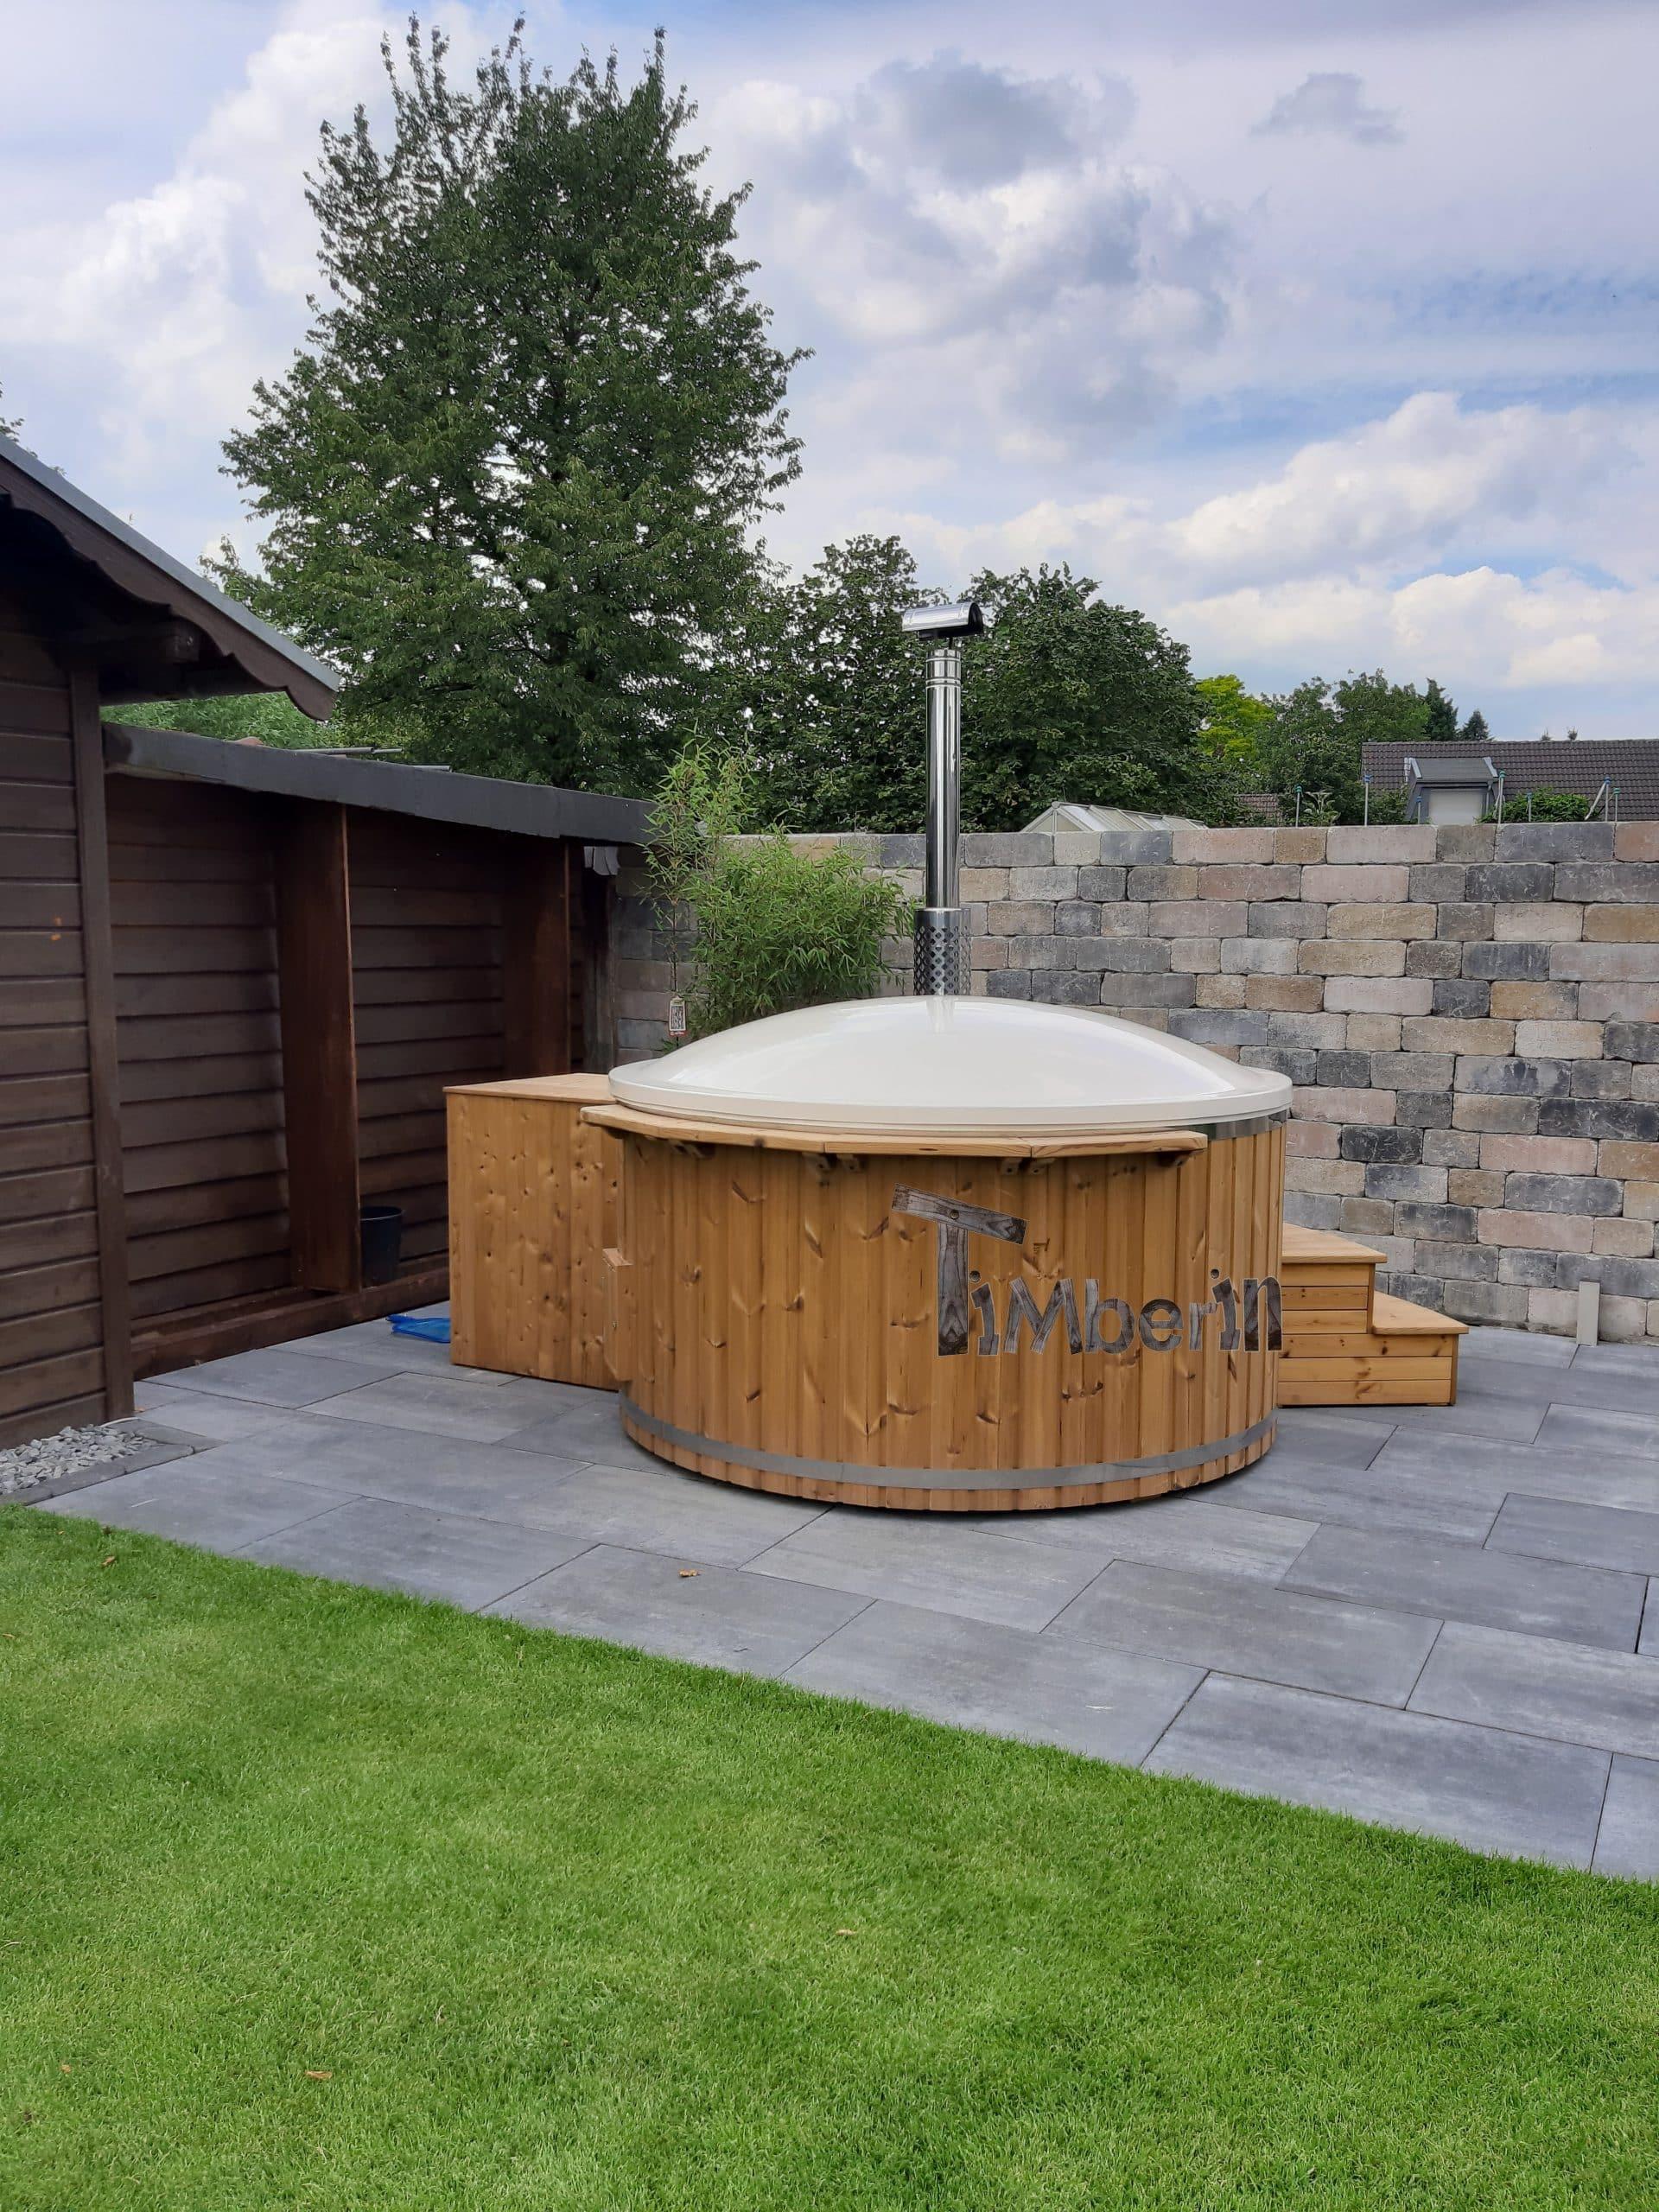 Badefass-gfk-mit-Whirlpool-Wellness-Royal-Marc-Krefeld-Deutschland-2-scaled Bewertungen - Erfahrung TimberIN